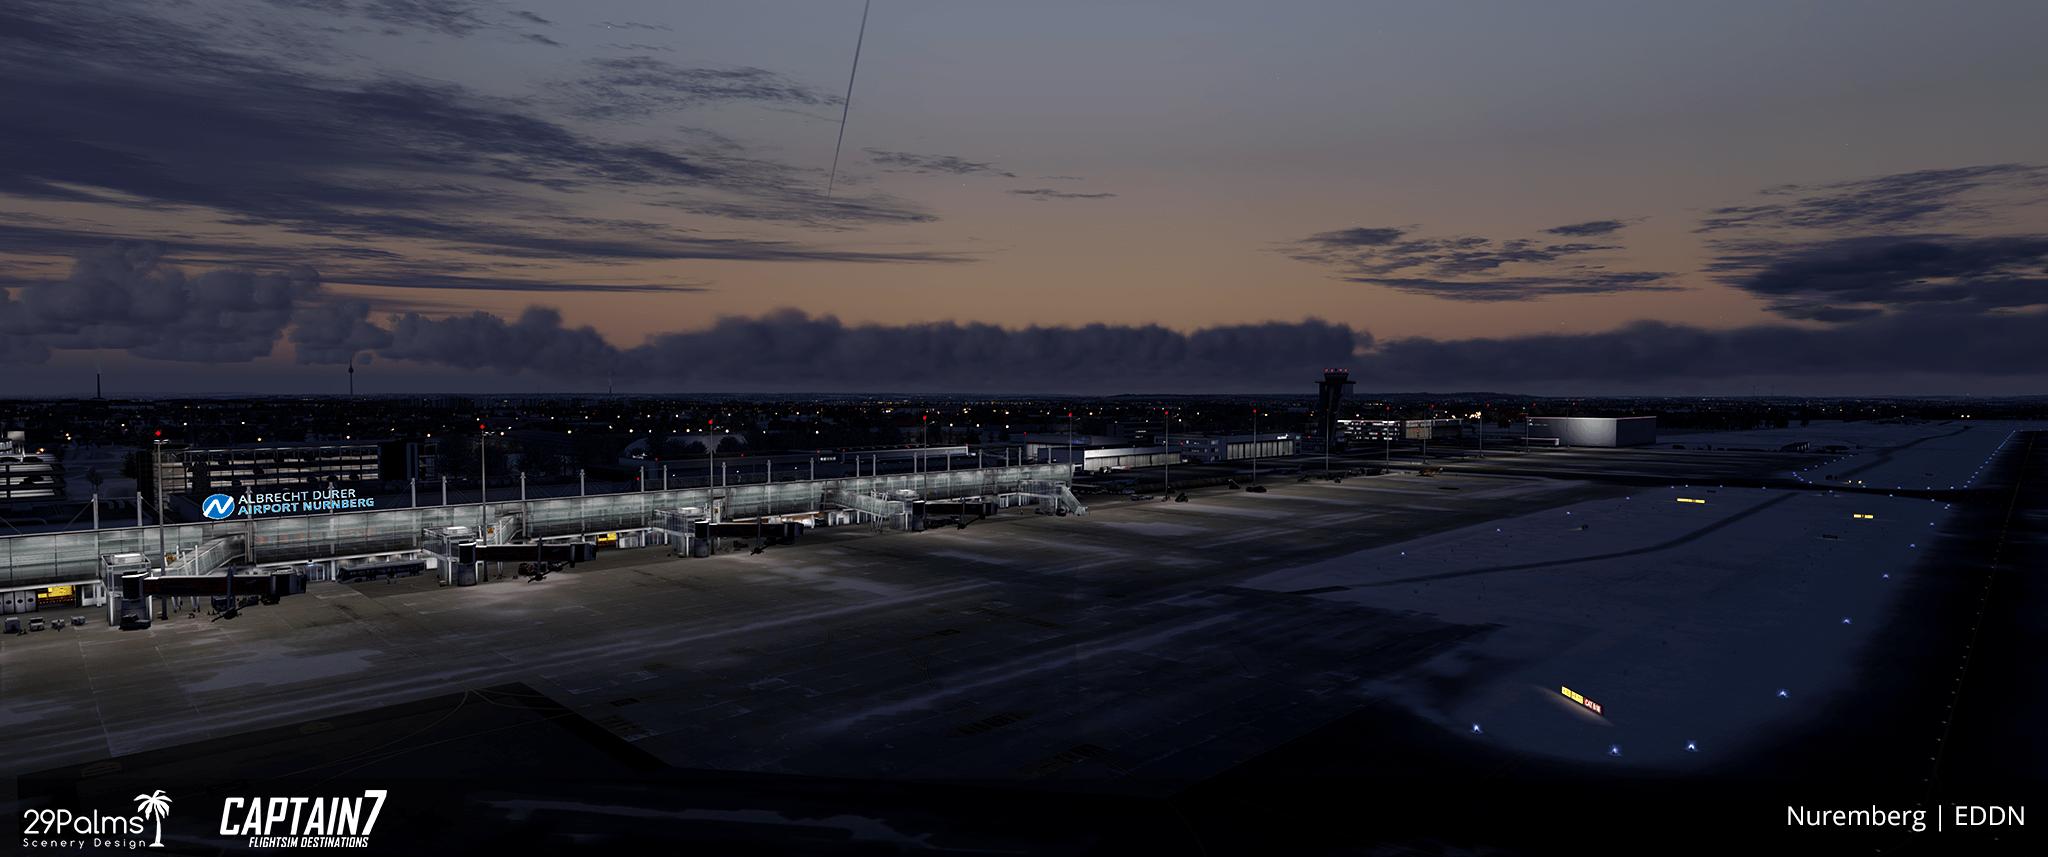 EDDN Albrecht Dürer Airport Nuremberg Scenery Addon for P3D | Captain7